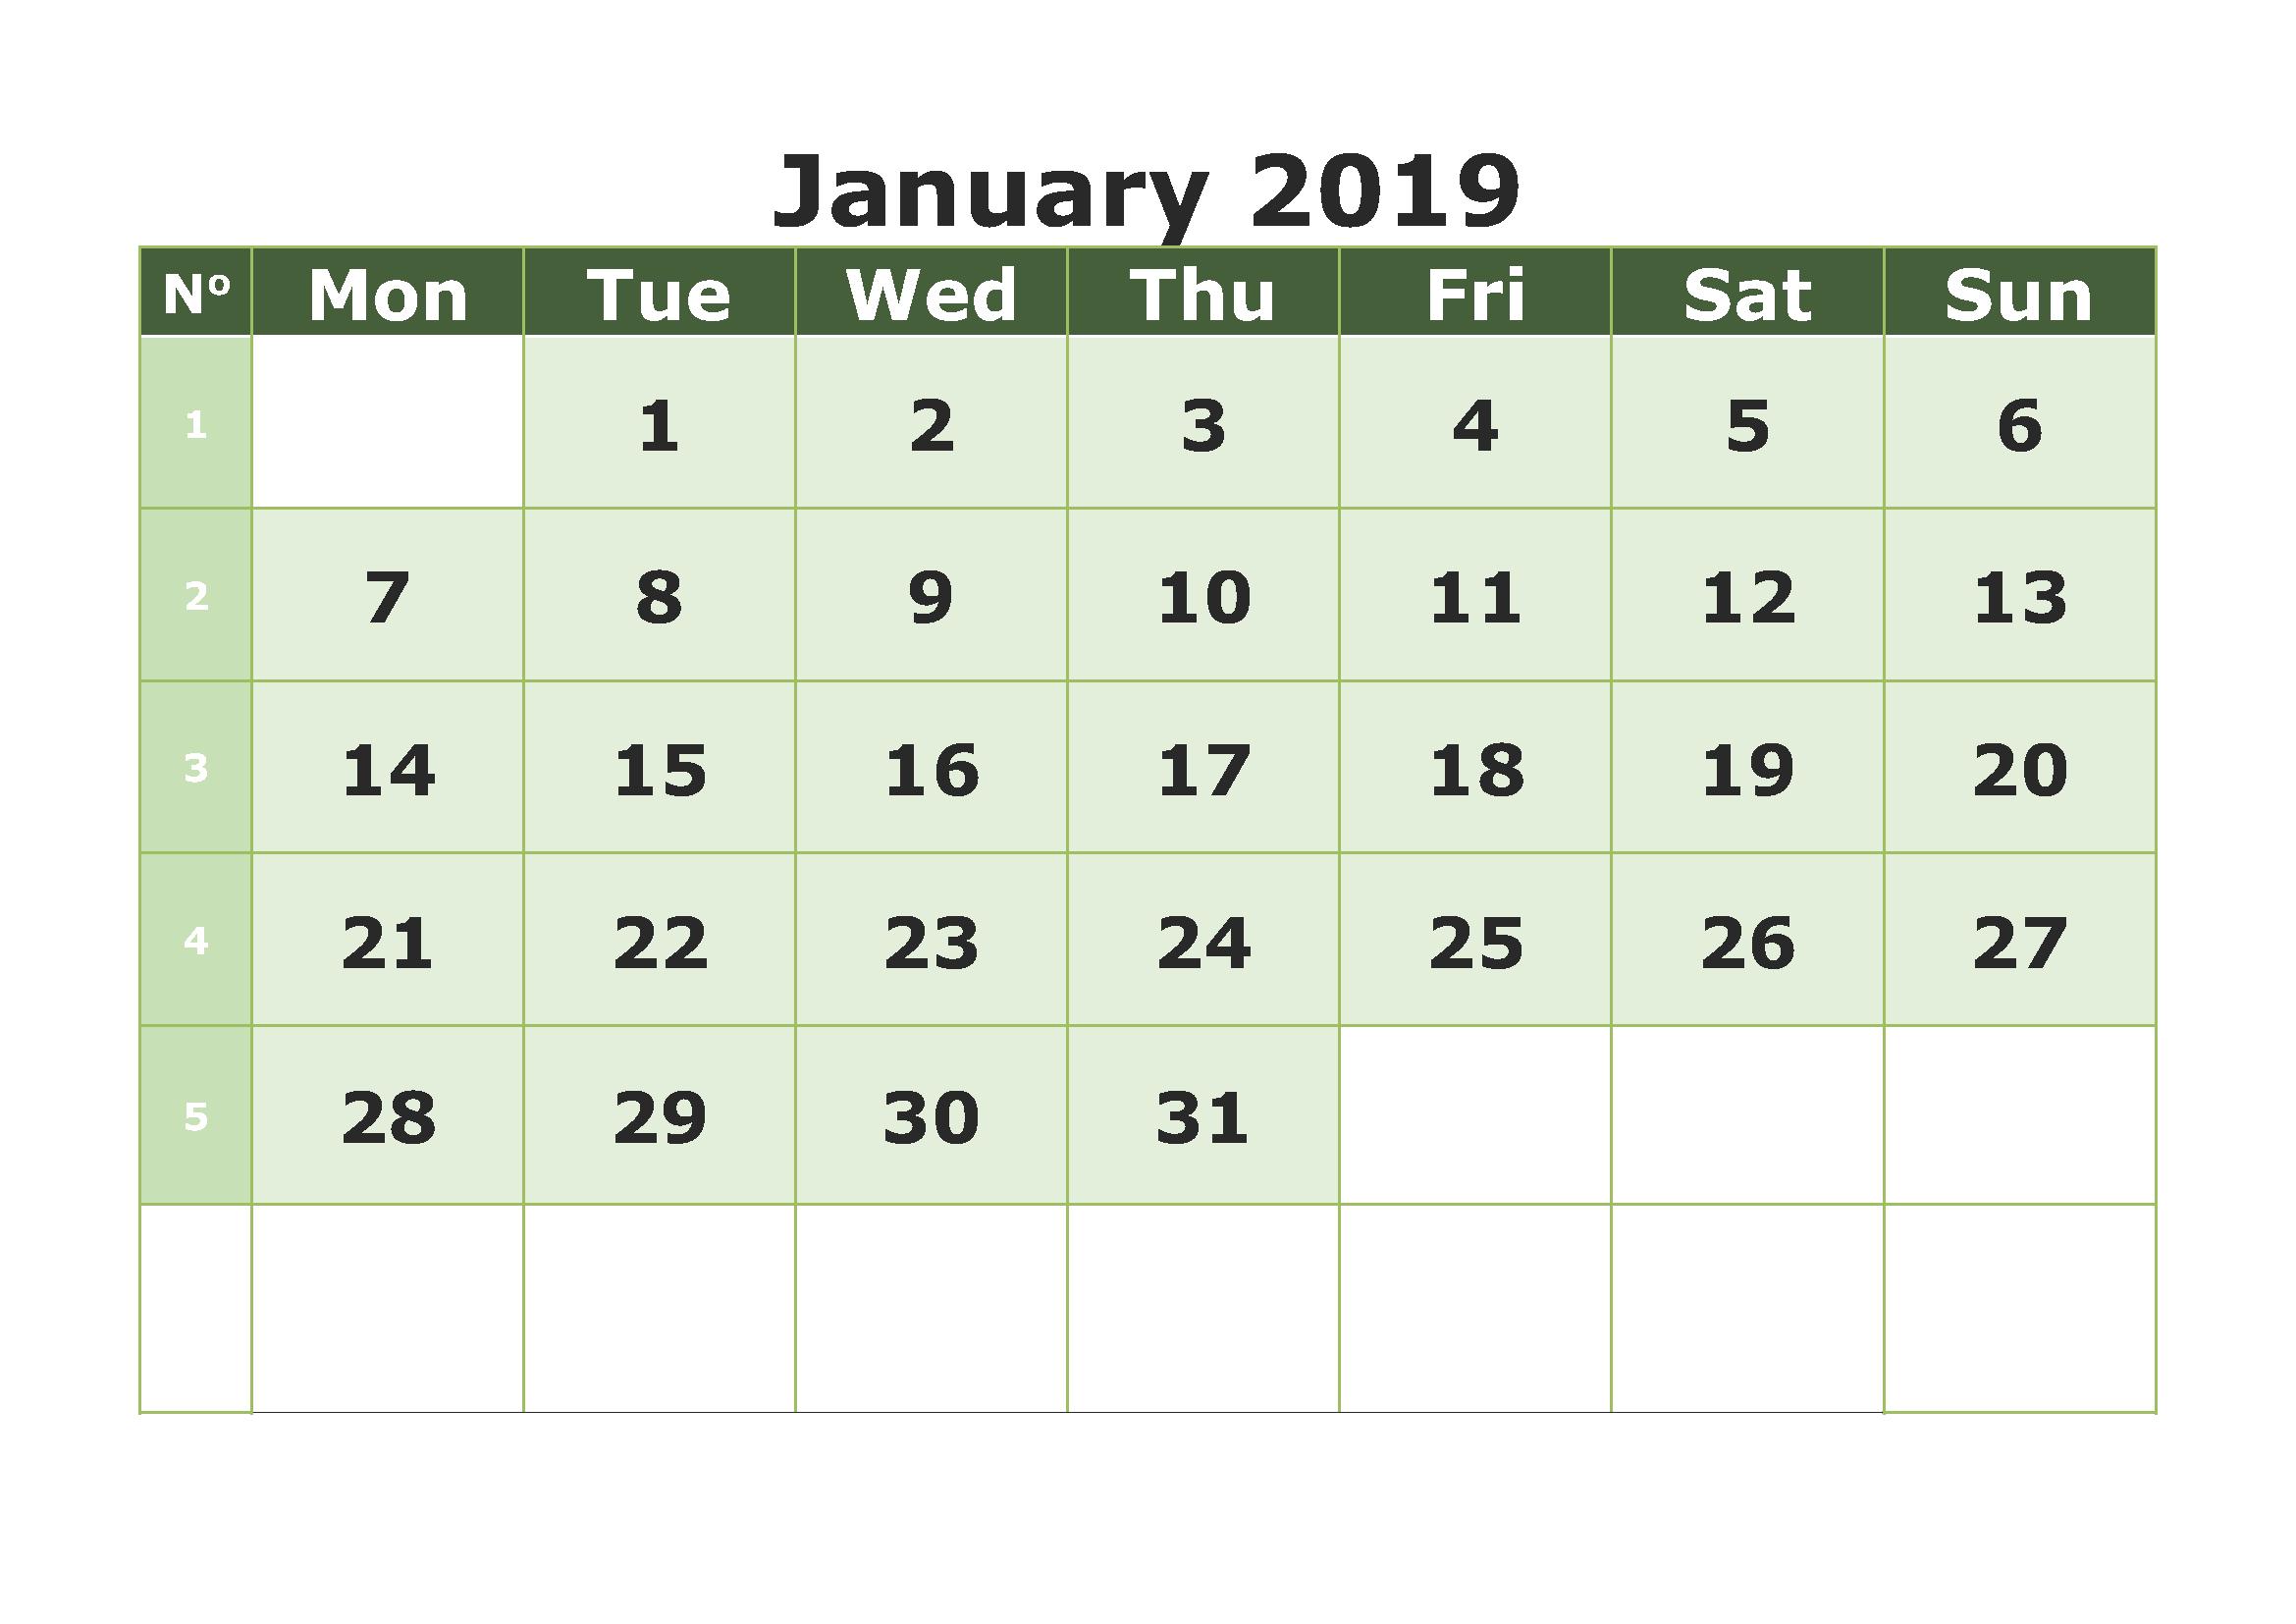 Print Blank Calendar January 2019 - Free Printable Calendar within Free Printable Blank Calendars